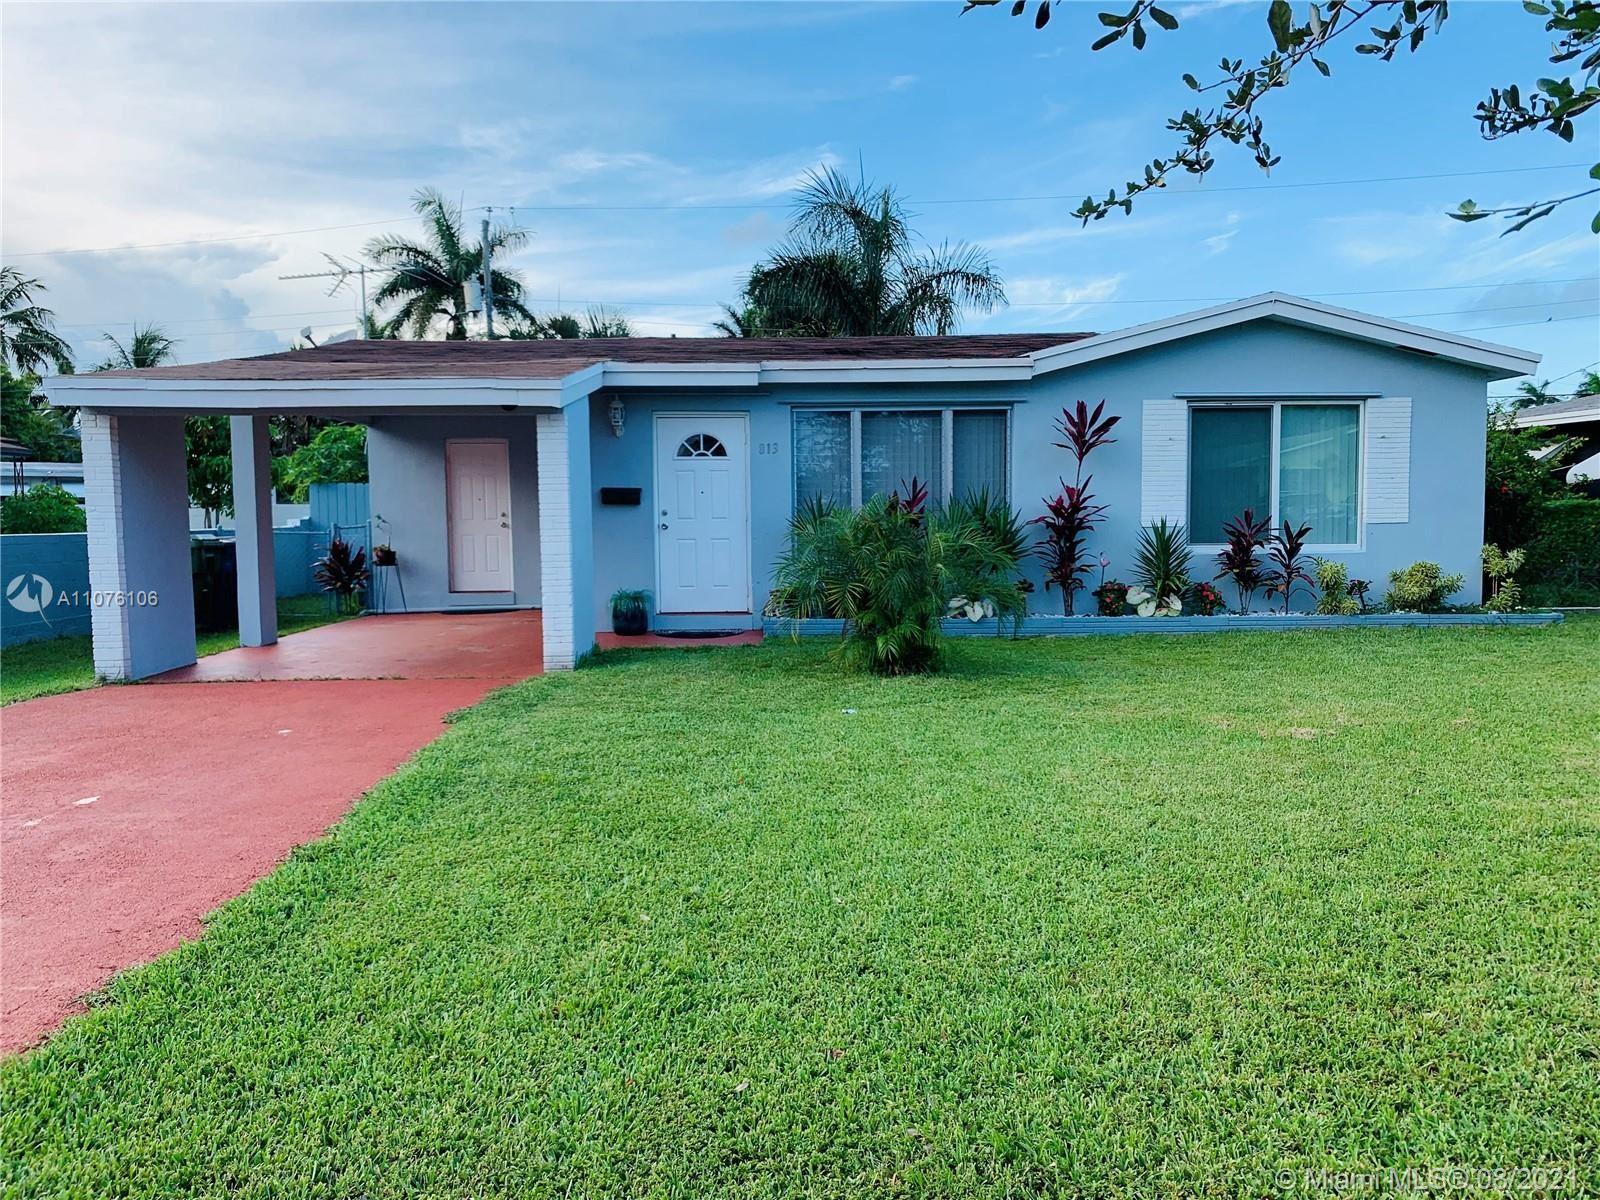 813 NE 2nd St, Hallandale Beach, FL 33009 - #: A11076106